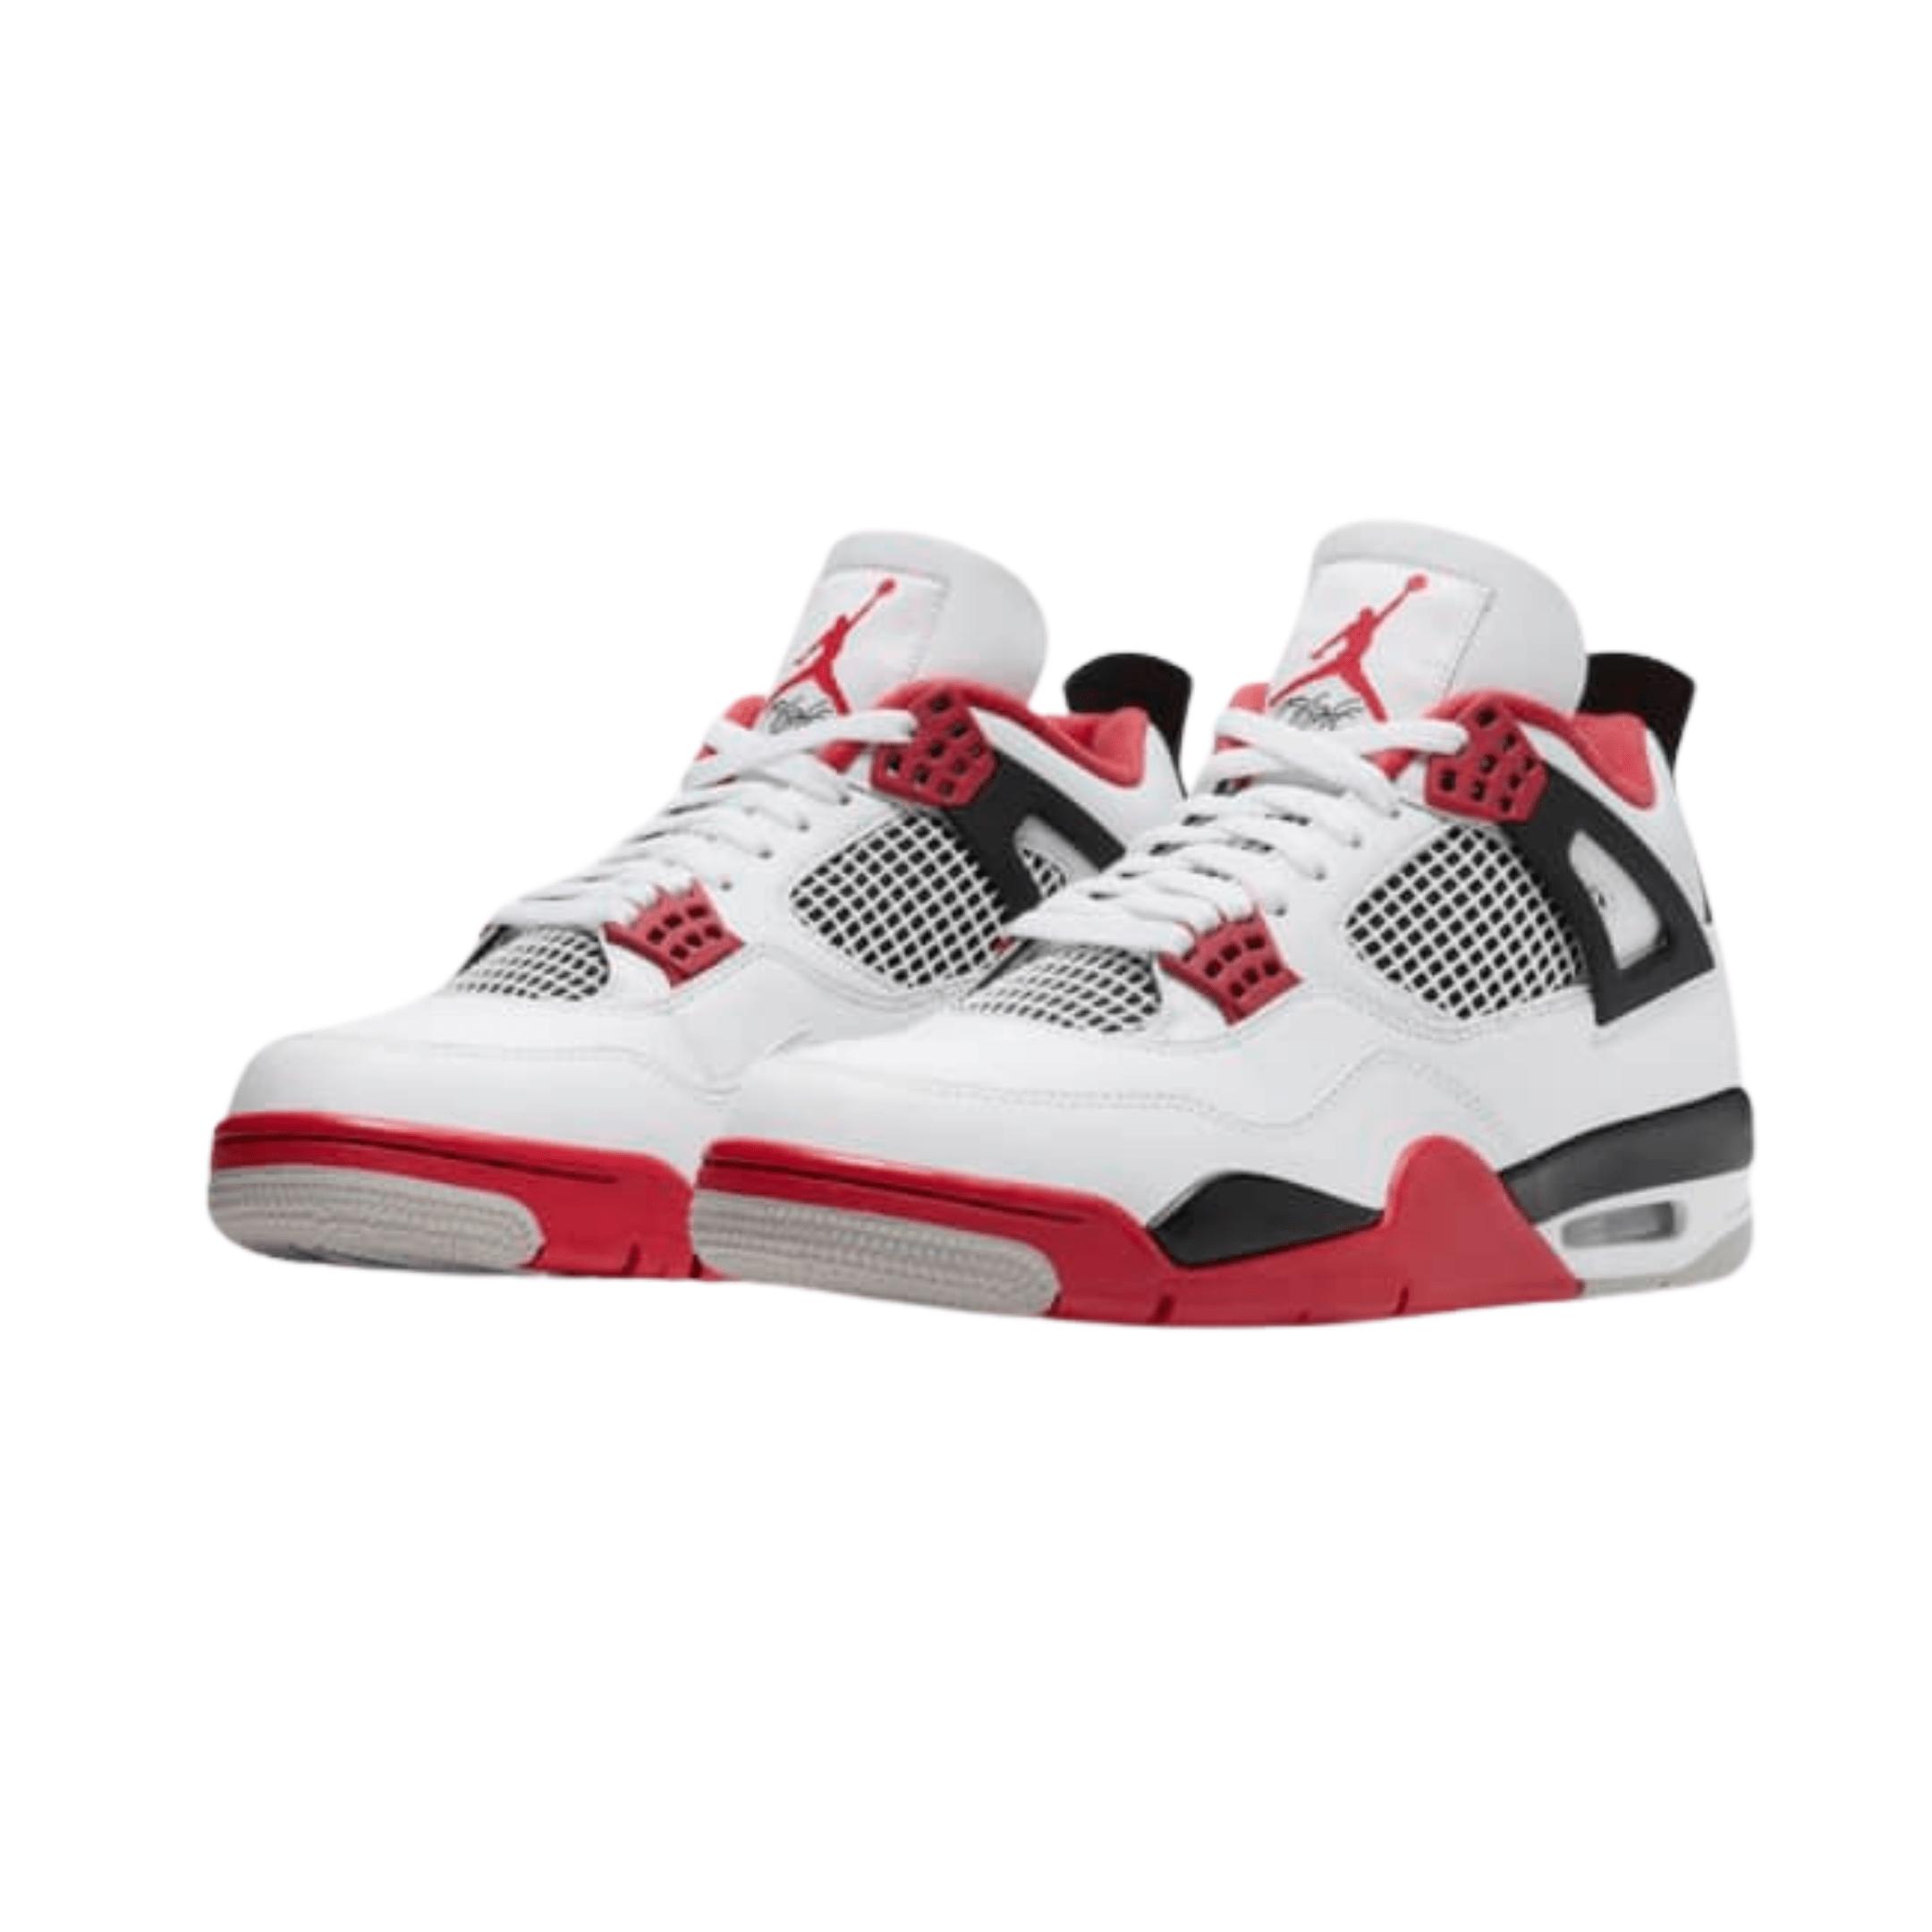 Nike Air Jordan 4 Fire Red-2